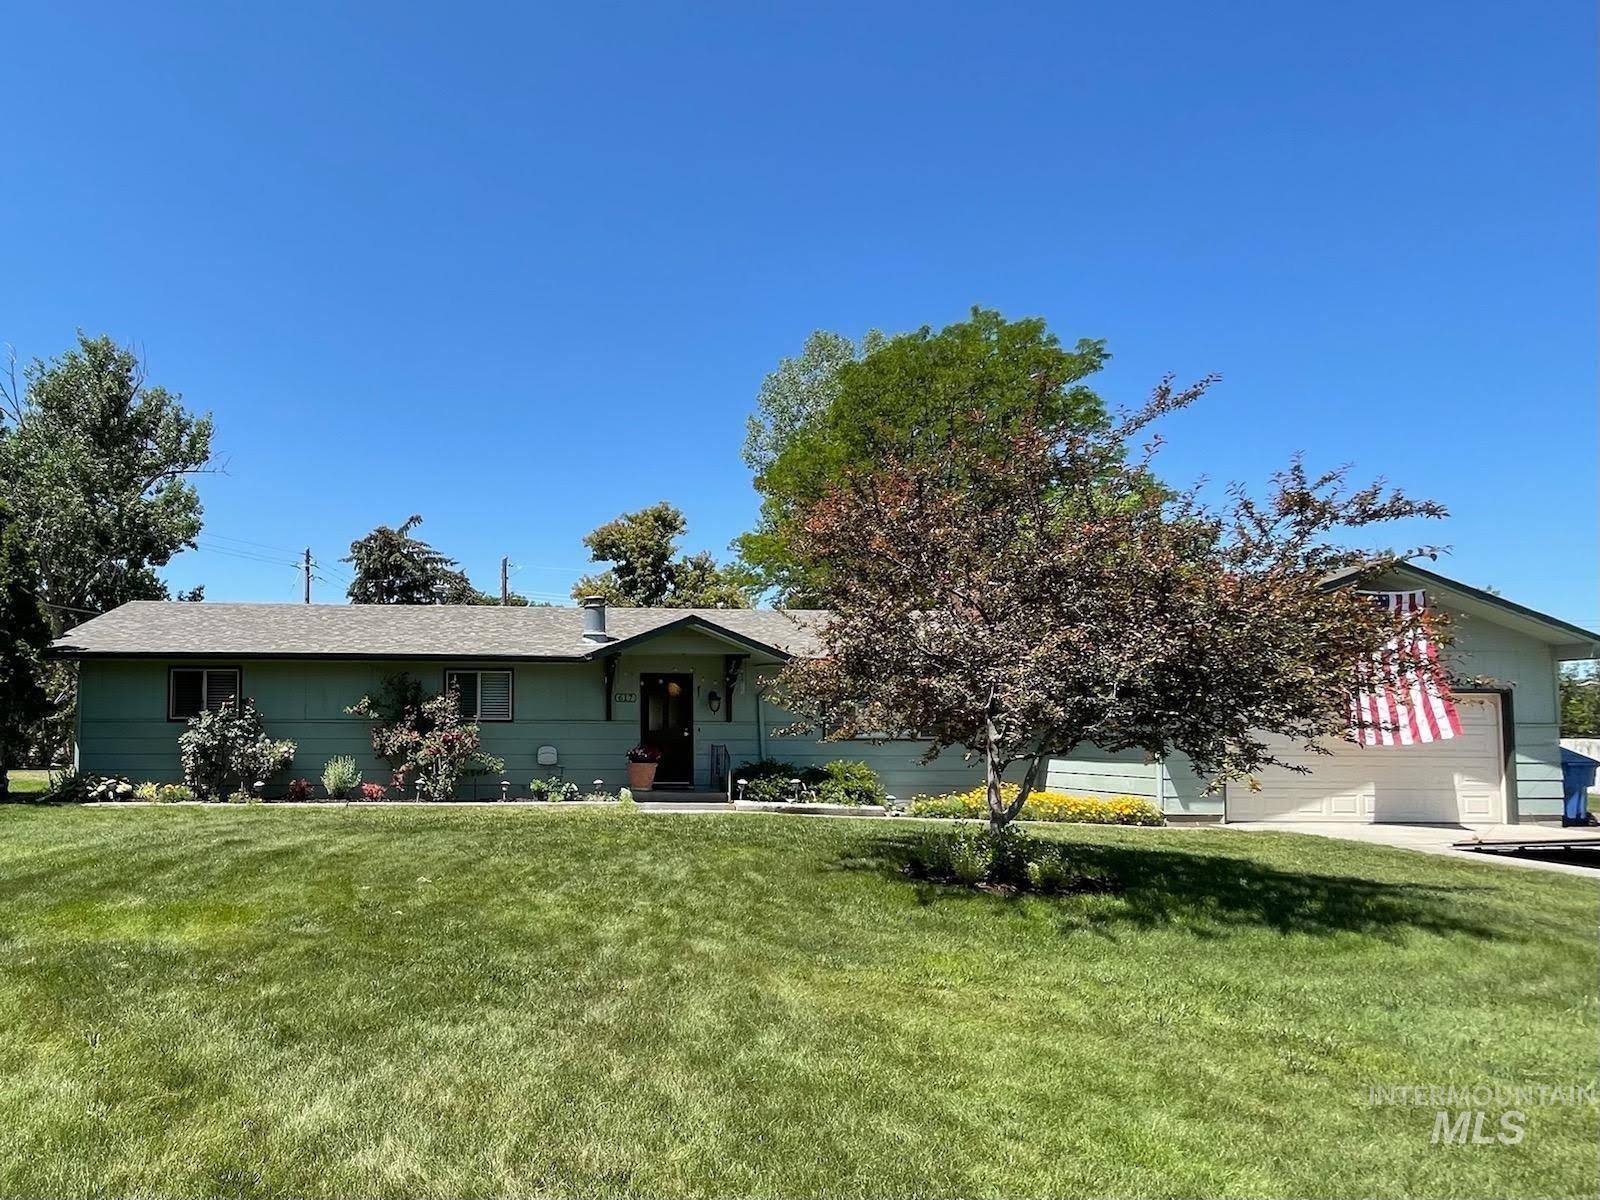 Photo of 617 Mae Dr, Twin Falls, ID 83301 (MLS # 98807279)